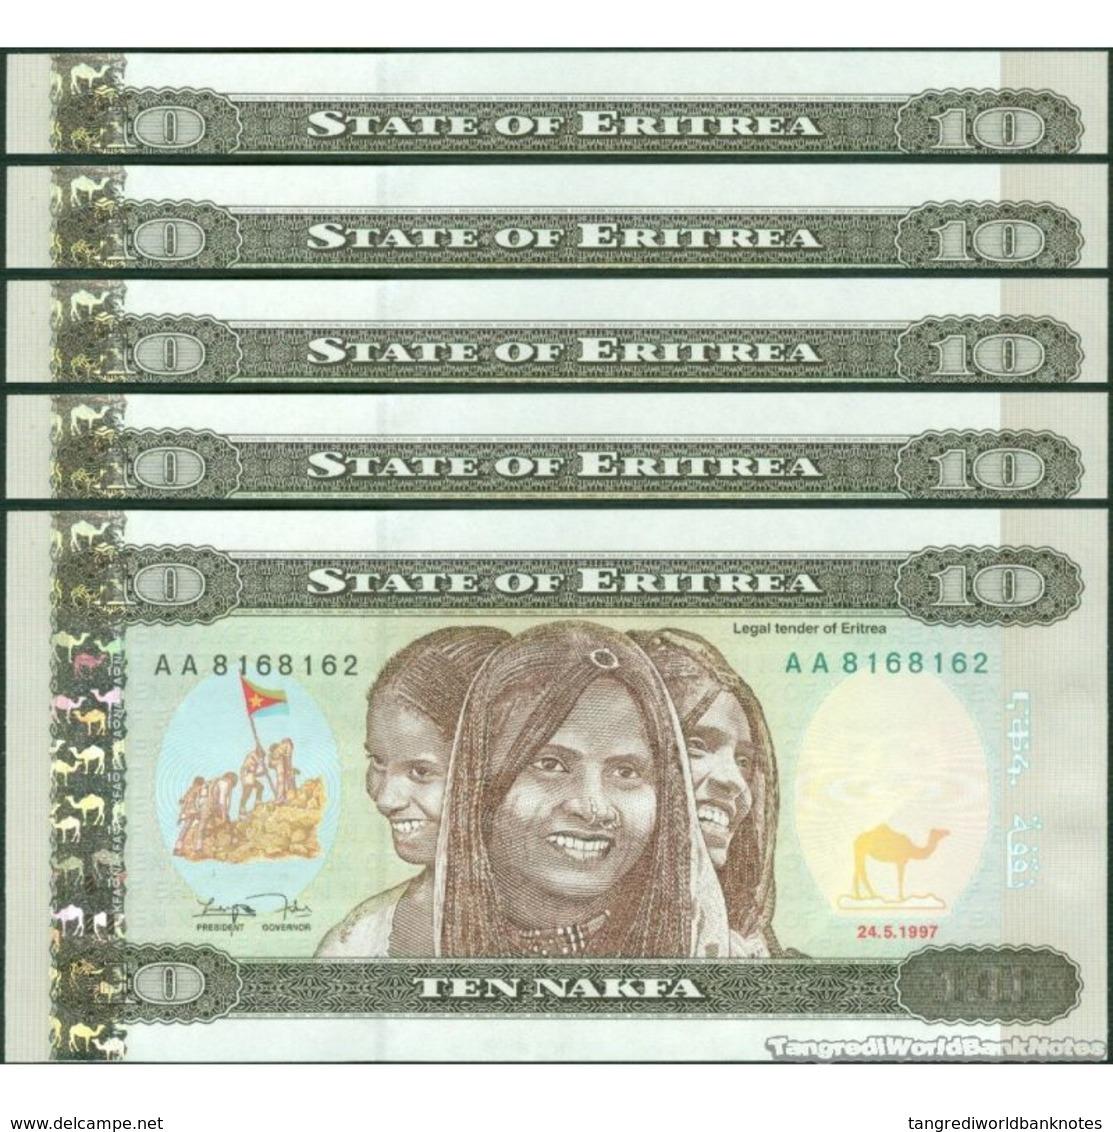 TWN - ERITREA 3 - 10 Nakfa 24.5.1997 DEALERS LOT X 5 - Prefix AA UNC - Eritrea